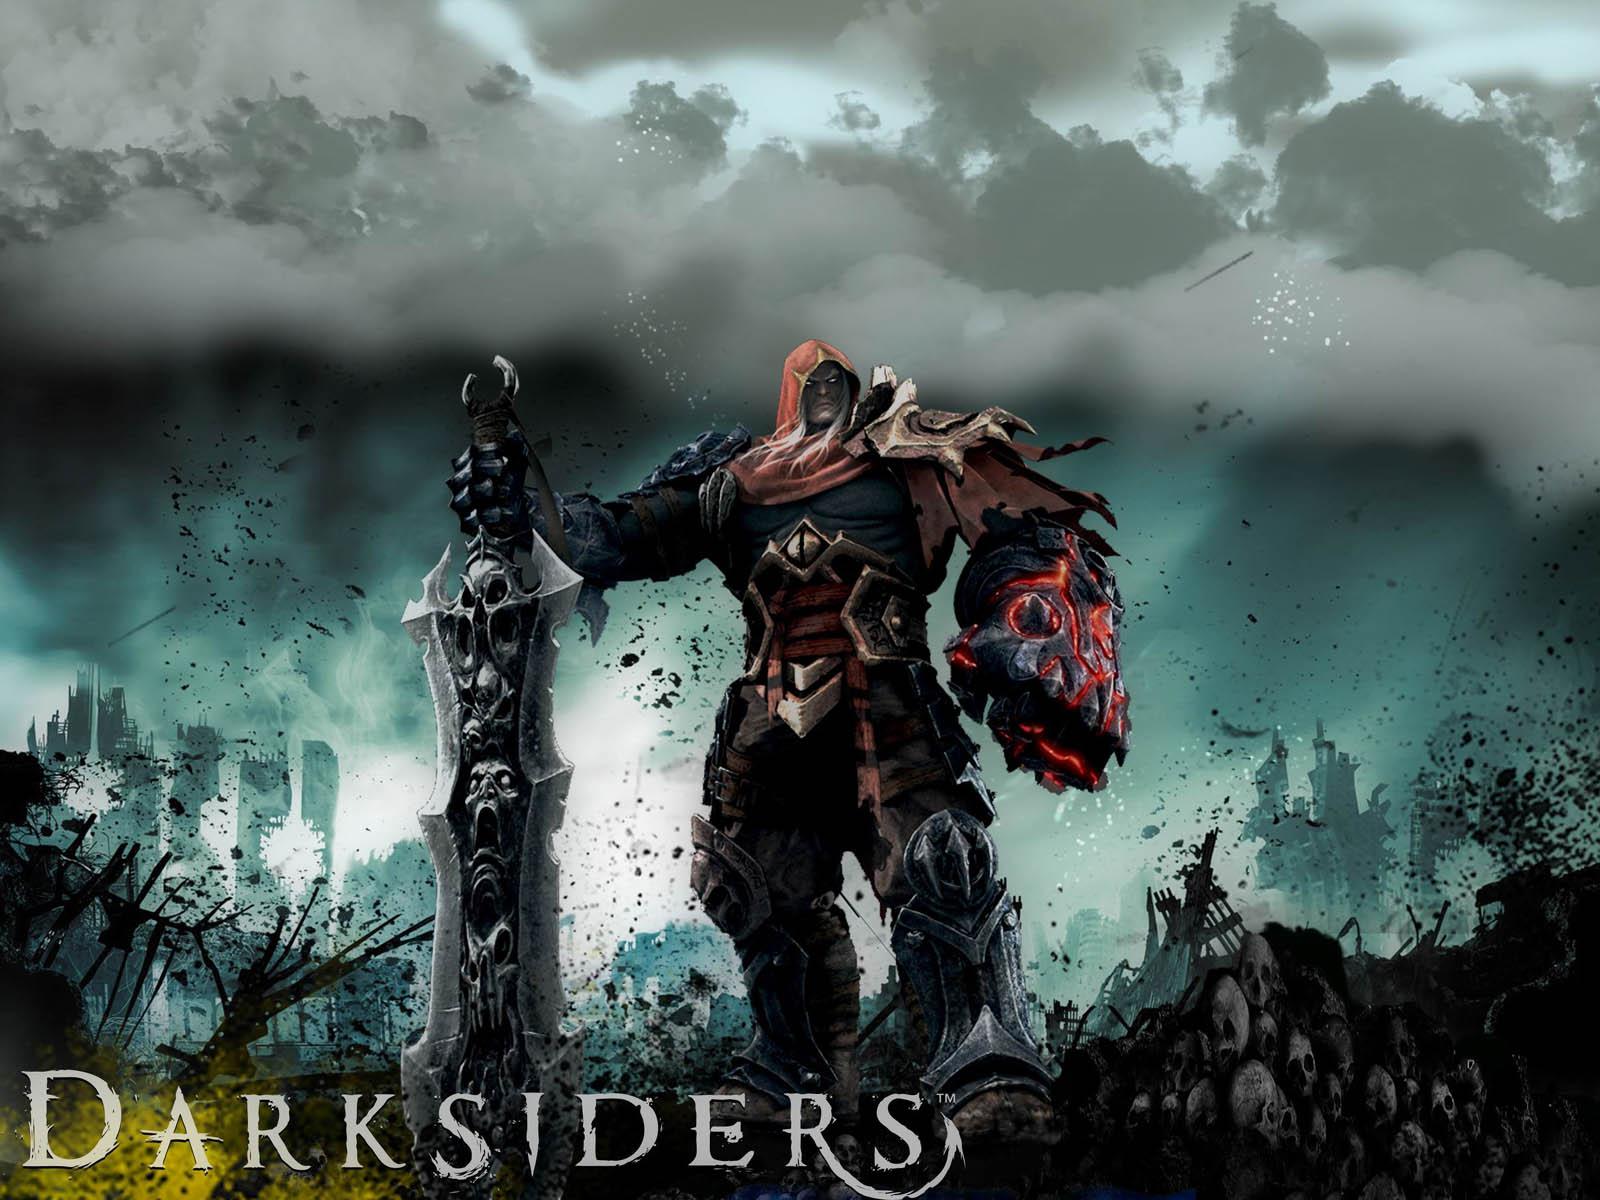 Darksiders Game Wallpapers Wallpaper 1600x1200